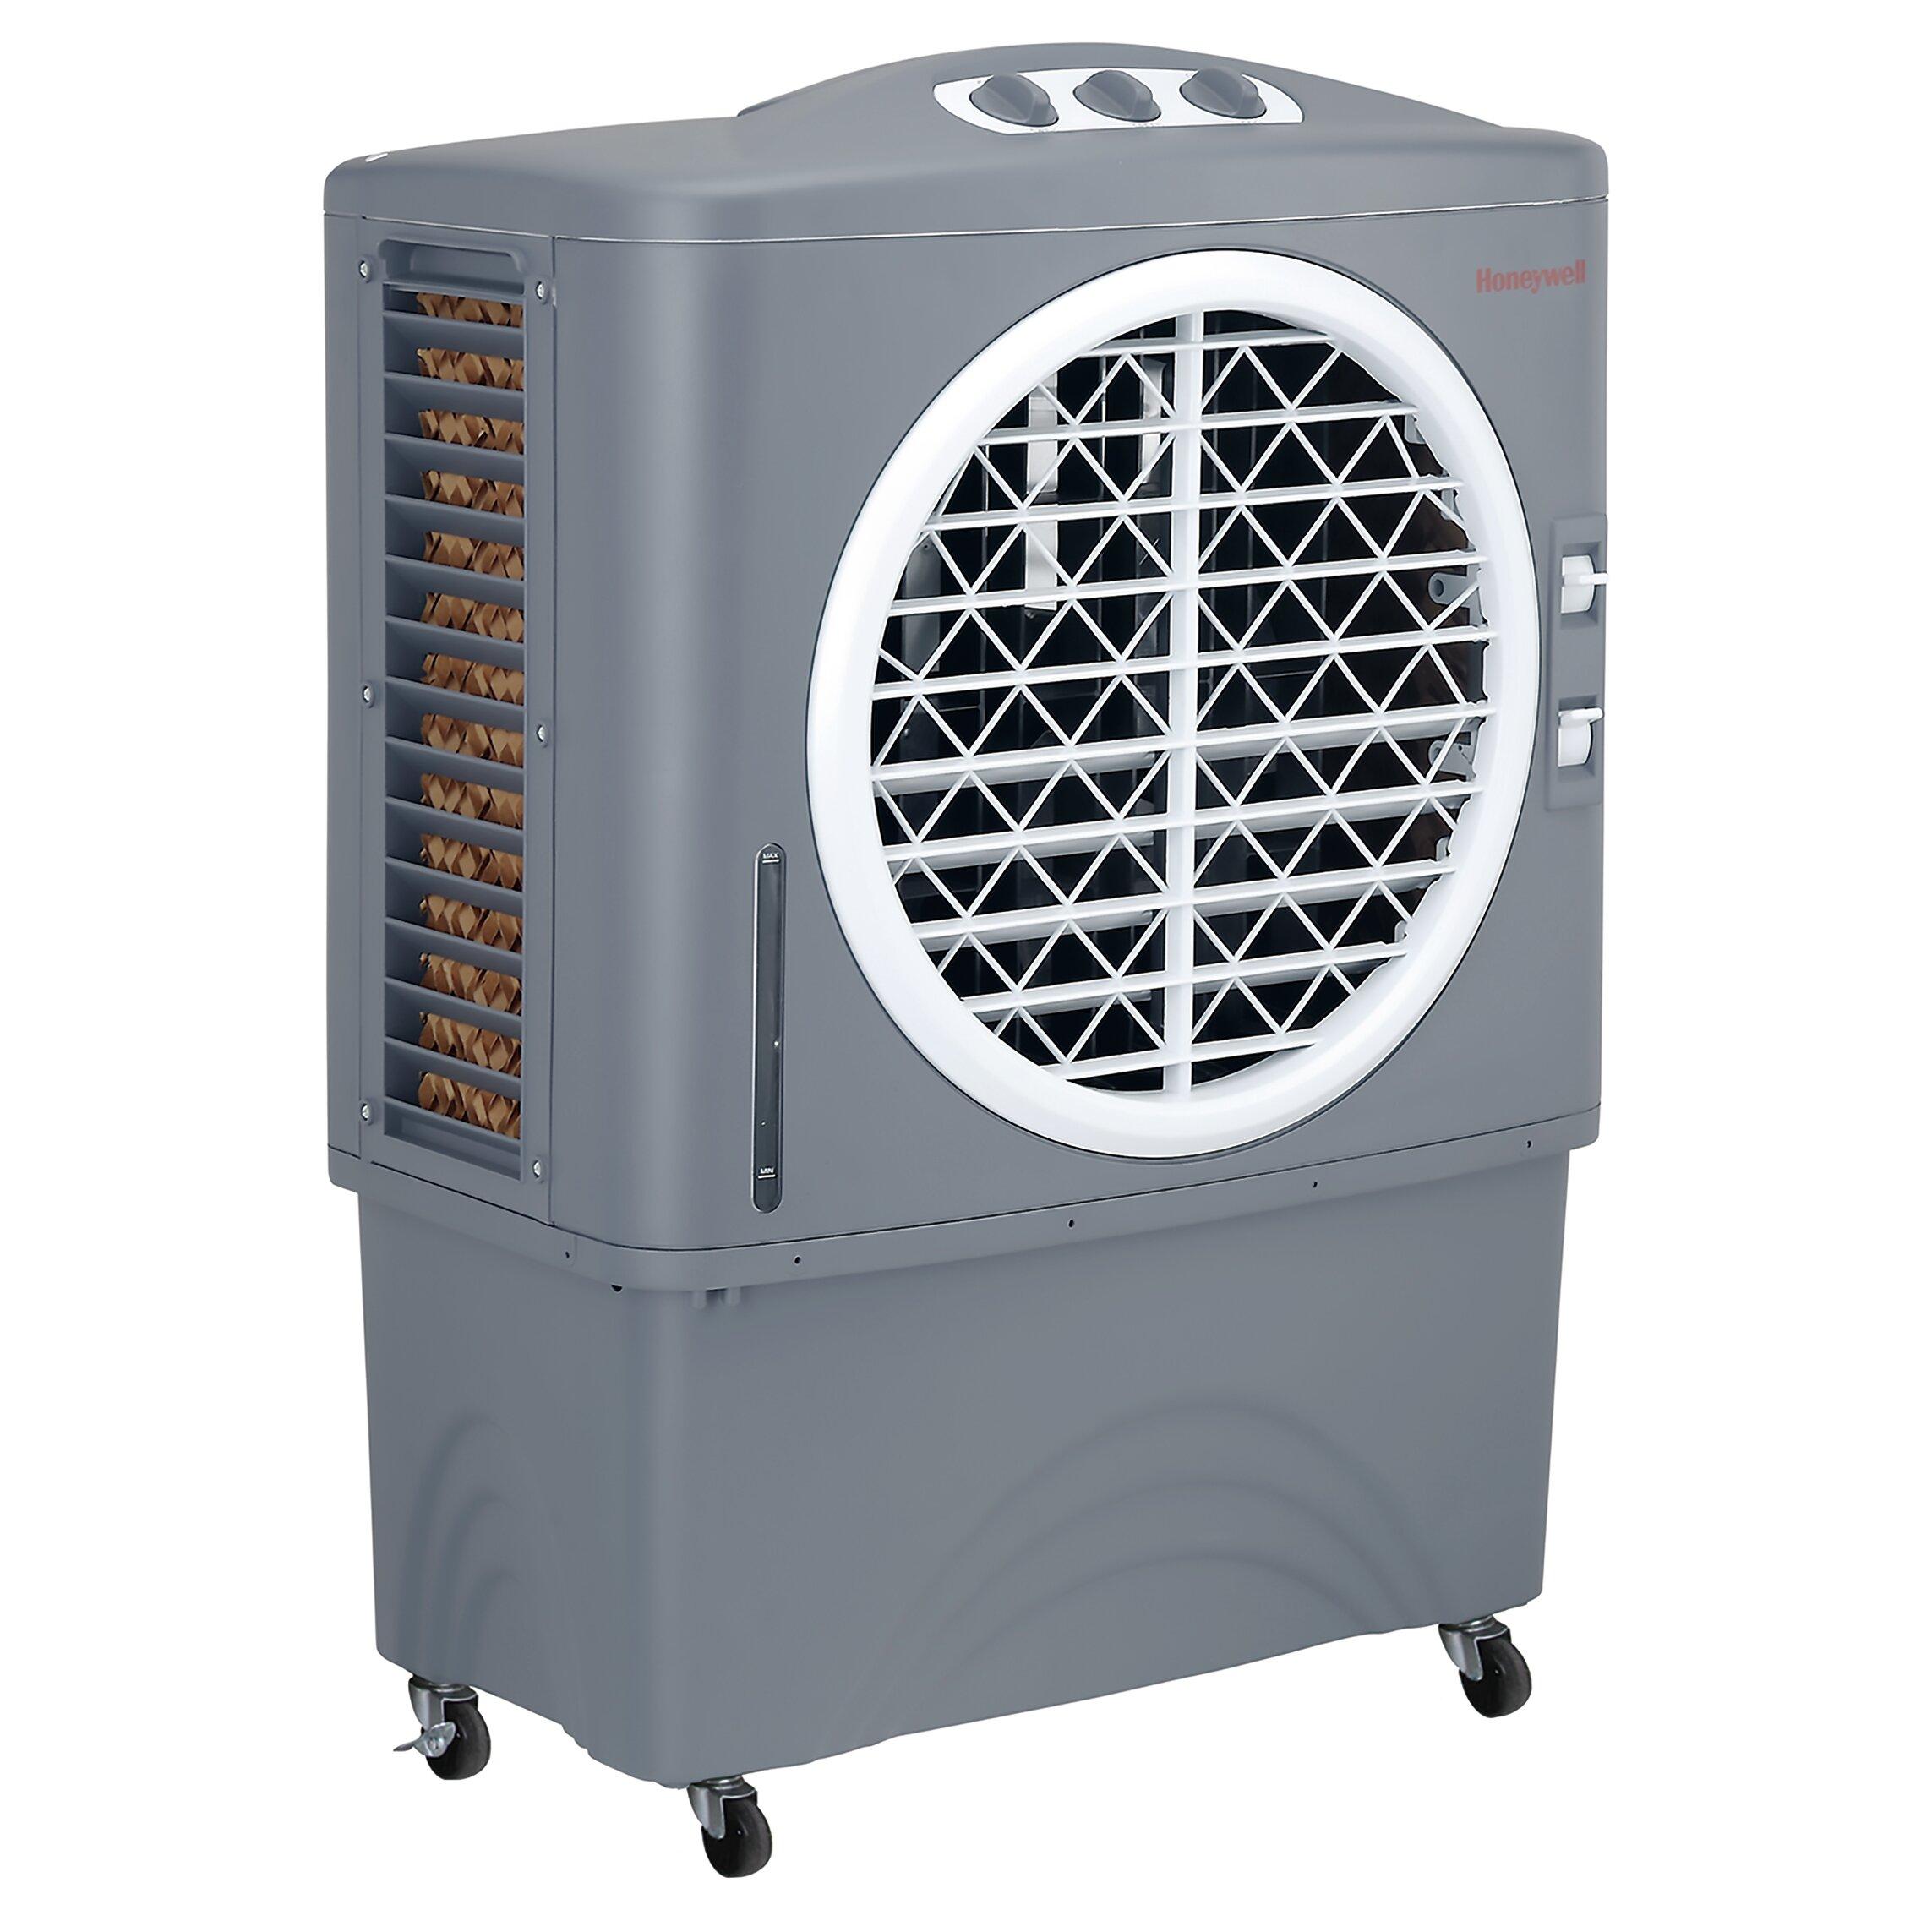 Honeywell 100 Pt. Evaporative Air Cooler & Reviews | Wayfair